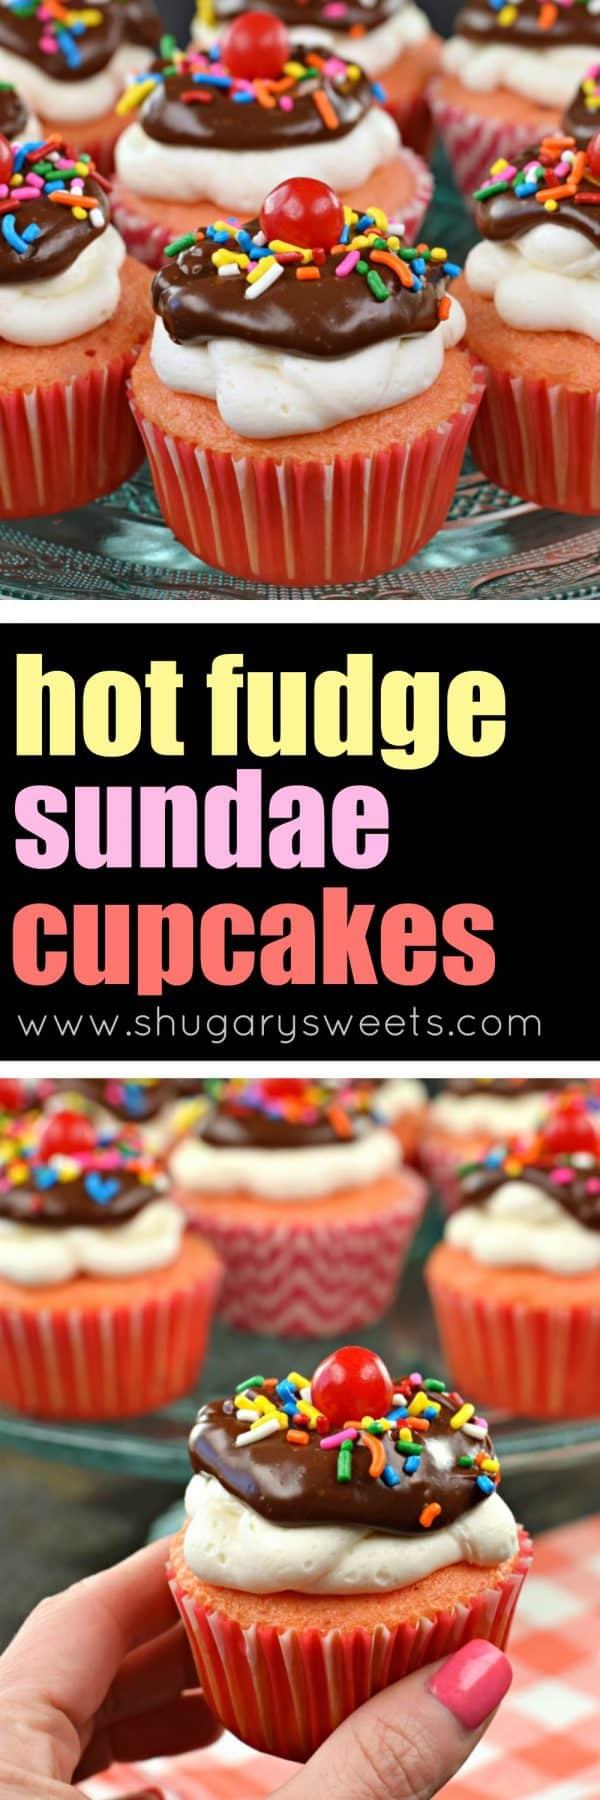 Hot Fudge Sundae Cupcakes with ganache